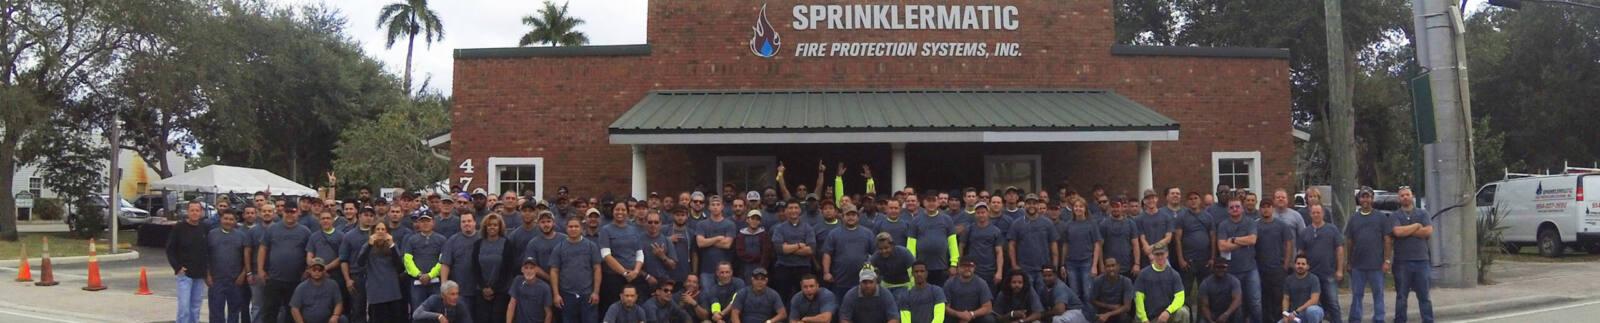 Sprinklermatic Best Practices Day 2016